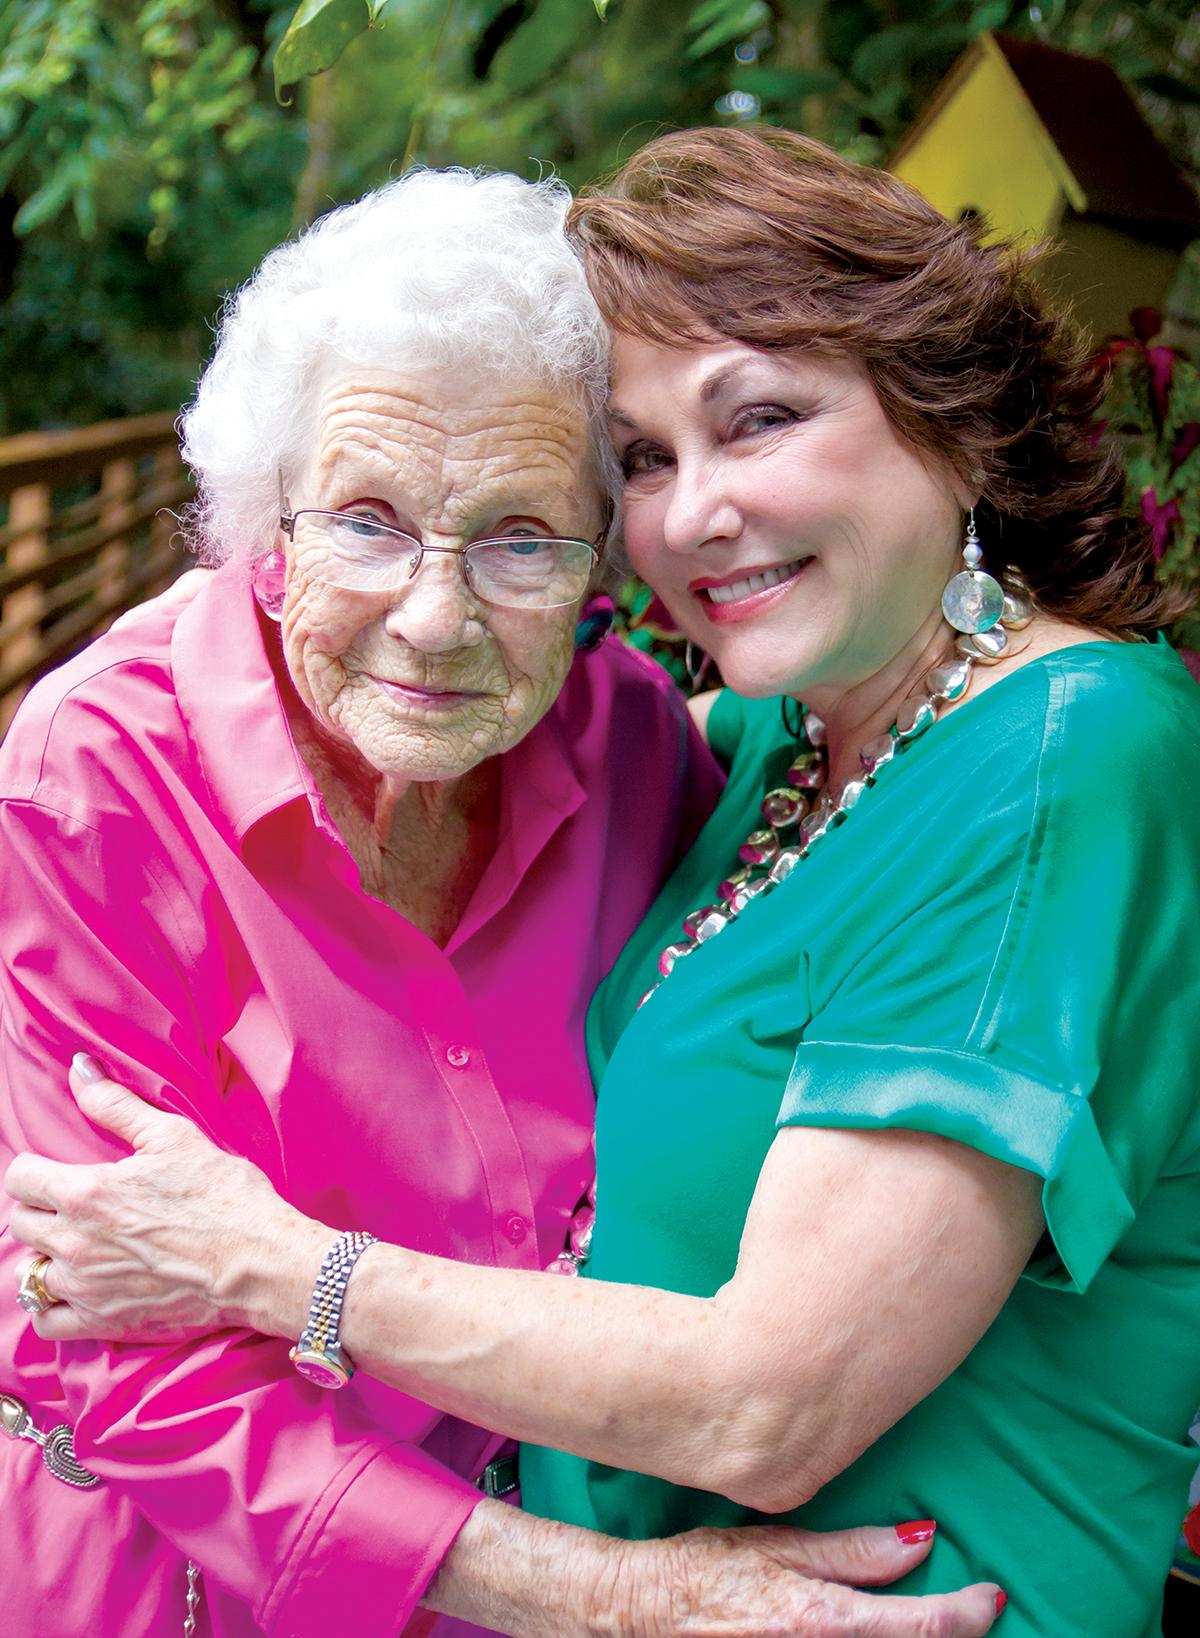 nonprofit not-for-profit hospice seniors children portraits people medical Health